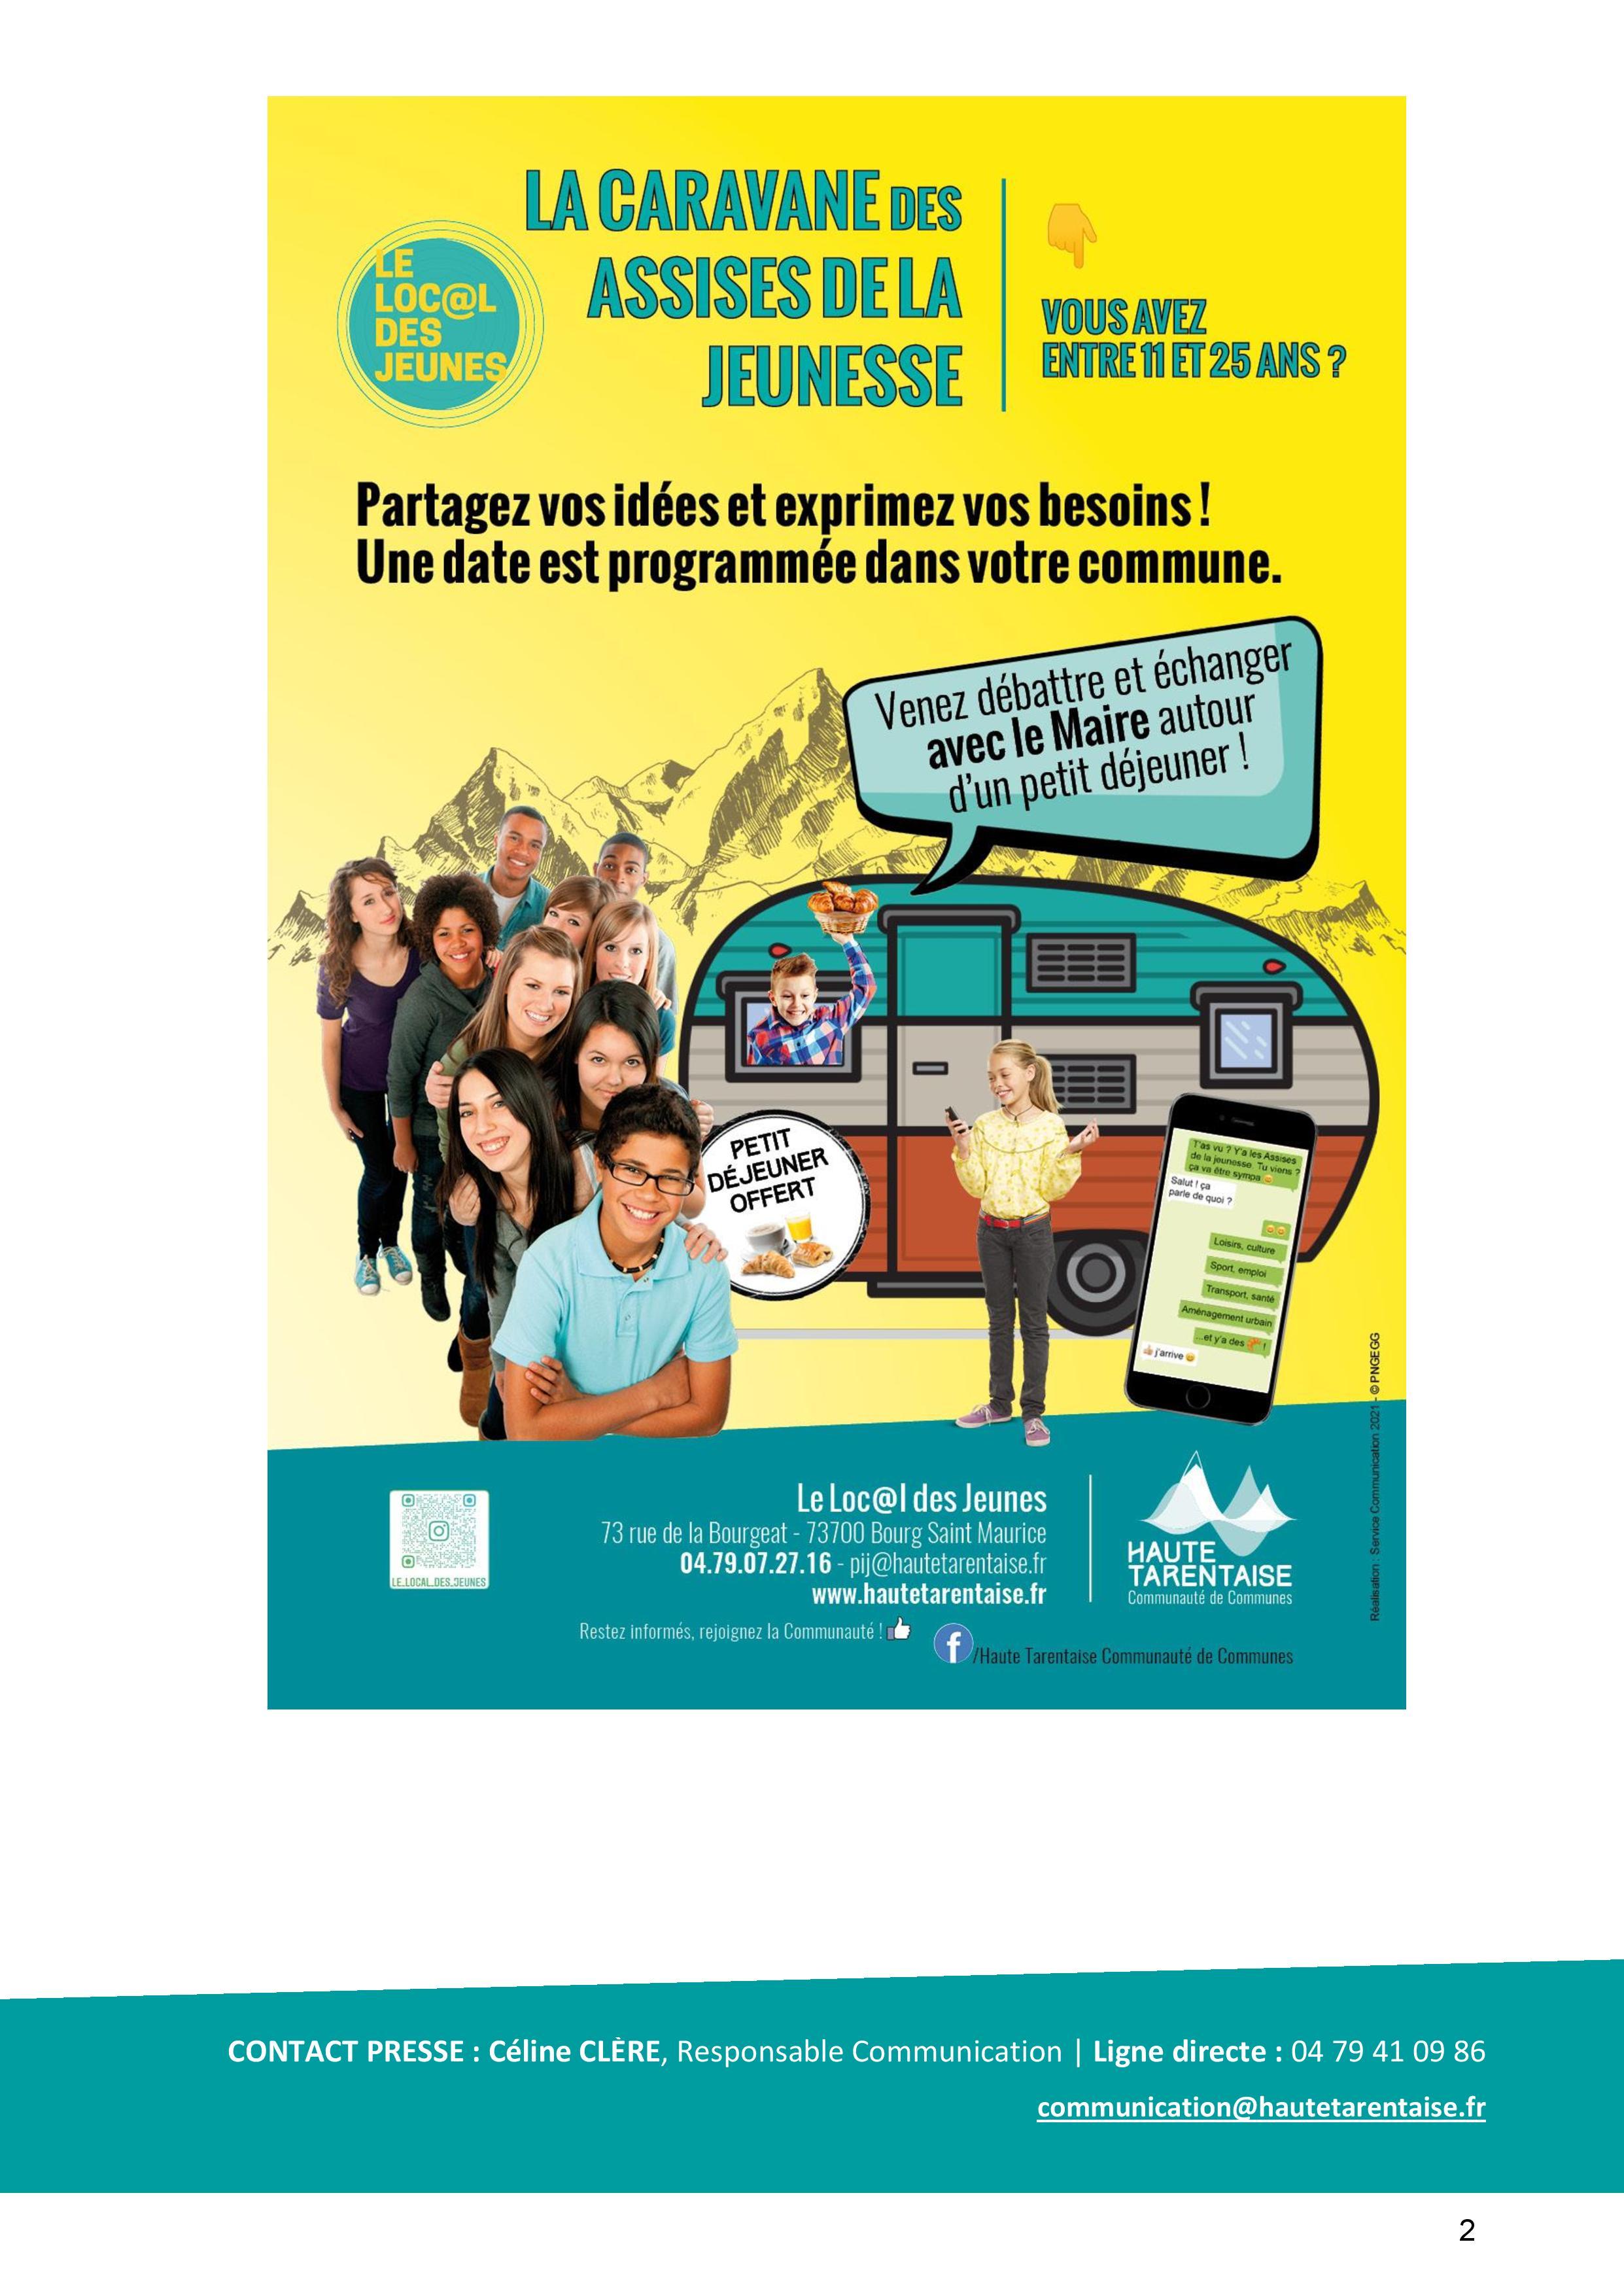 CP_caravane_assises_jeunesse_30.08.21-page-002.jpg